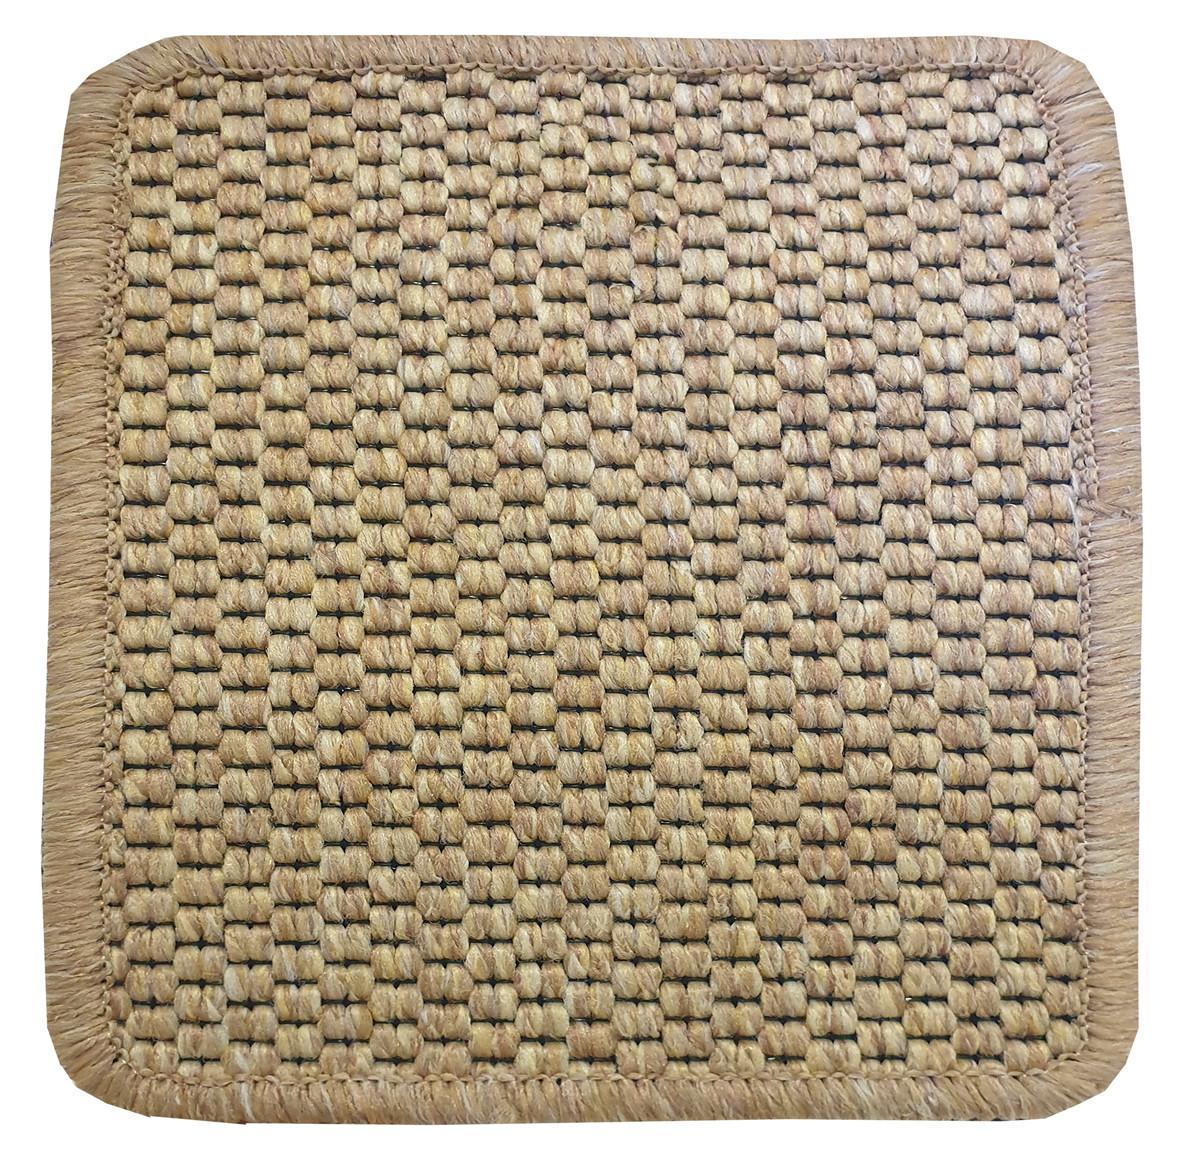 Vopi koberce Kusový koberec Nature terra čtverec - 180x180 cm